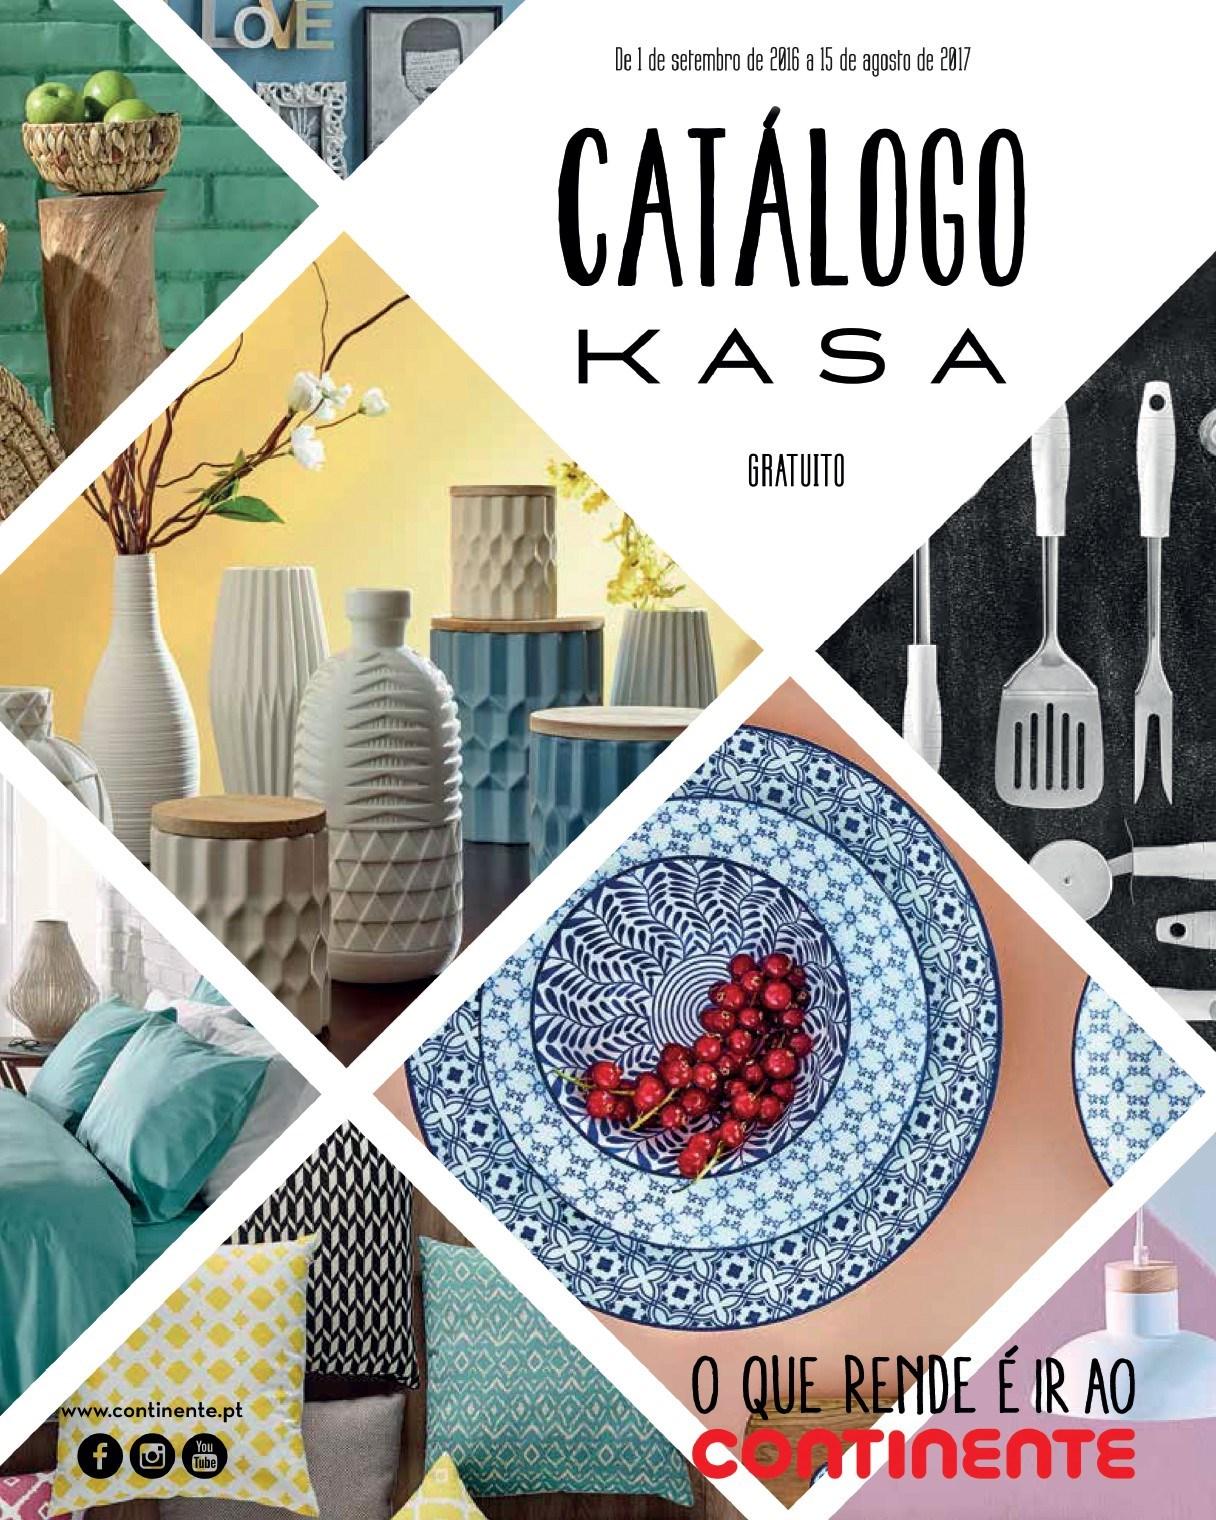 Cat logo kasa continente 2016 17 decora o e ideias for Catalogo bp 2017